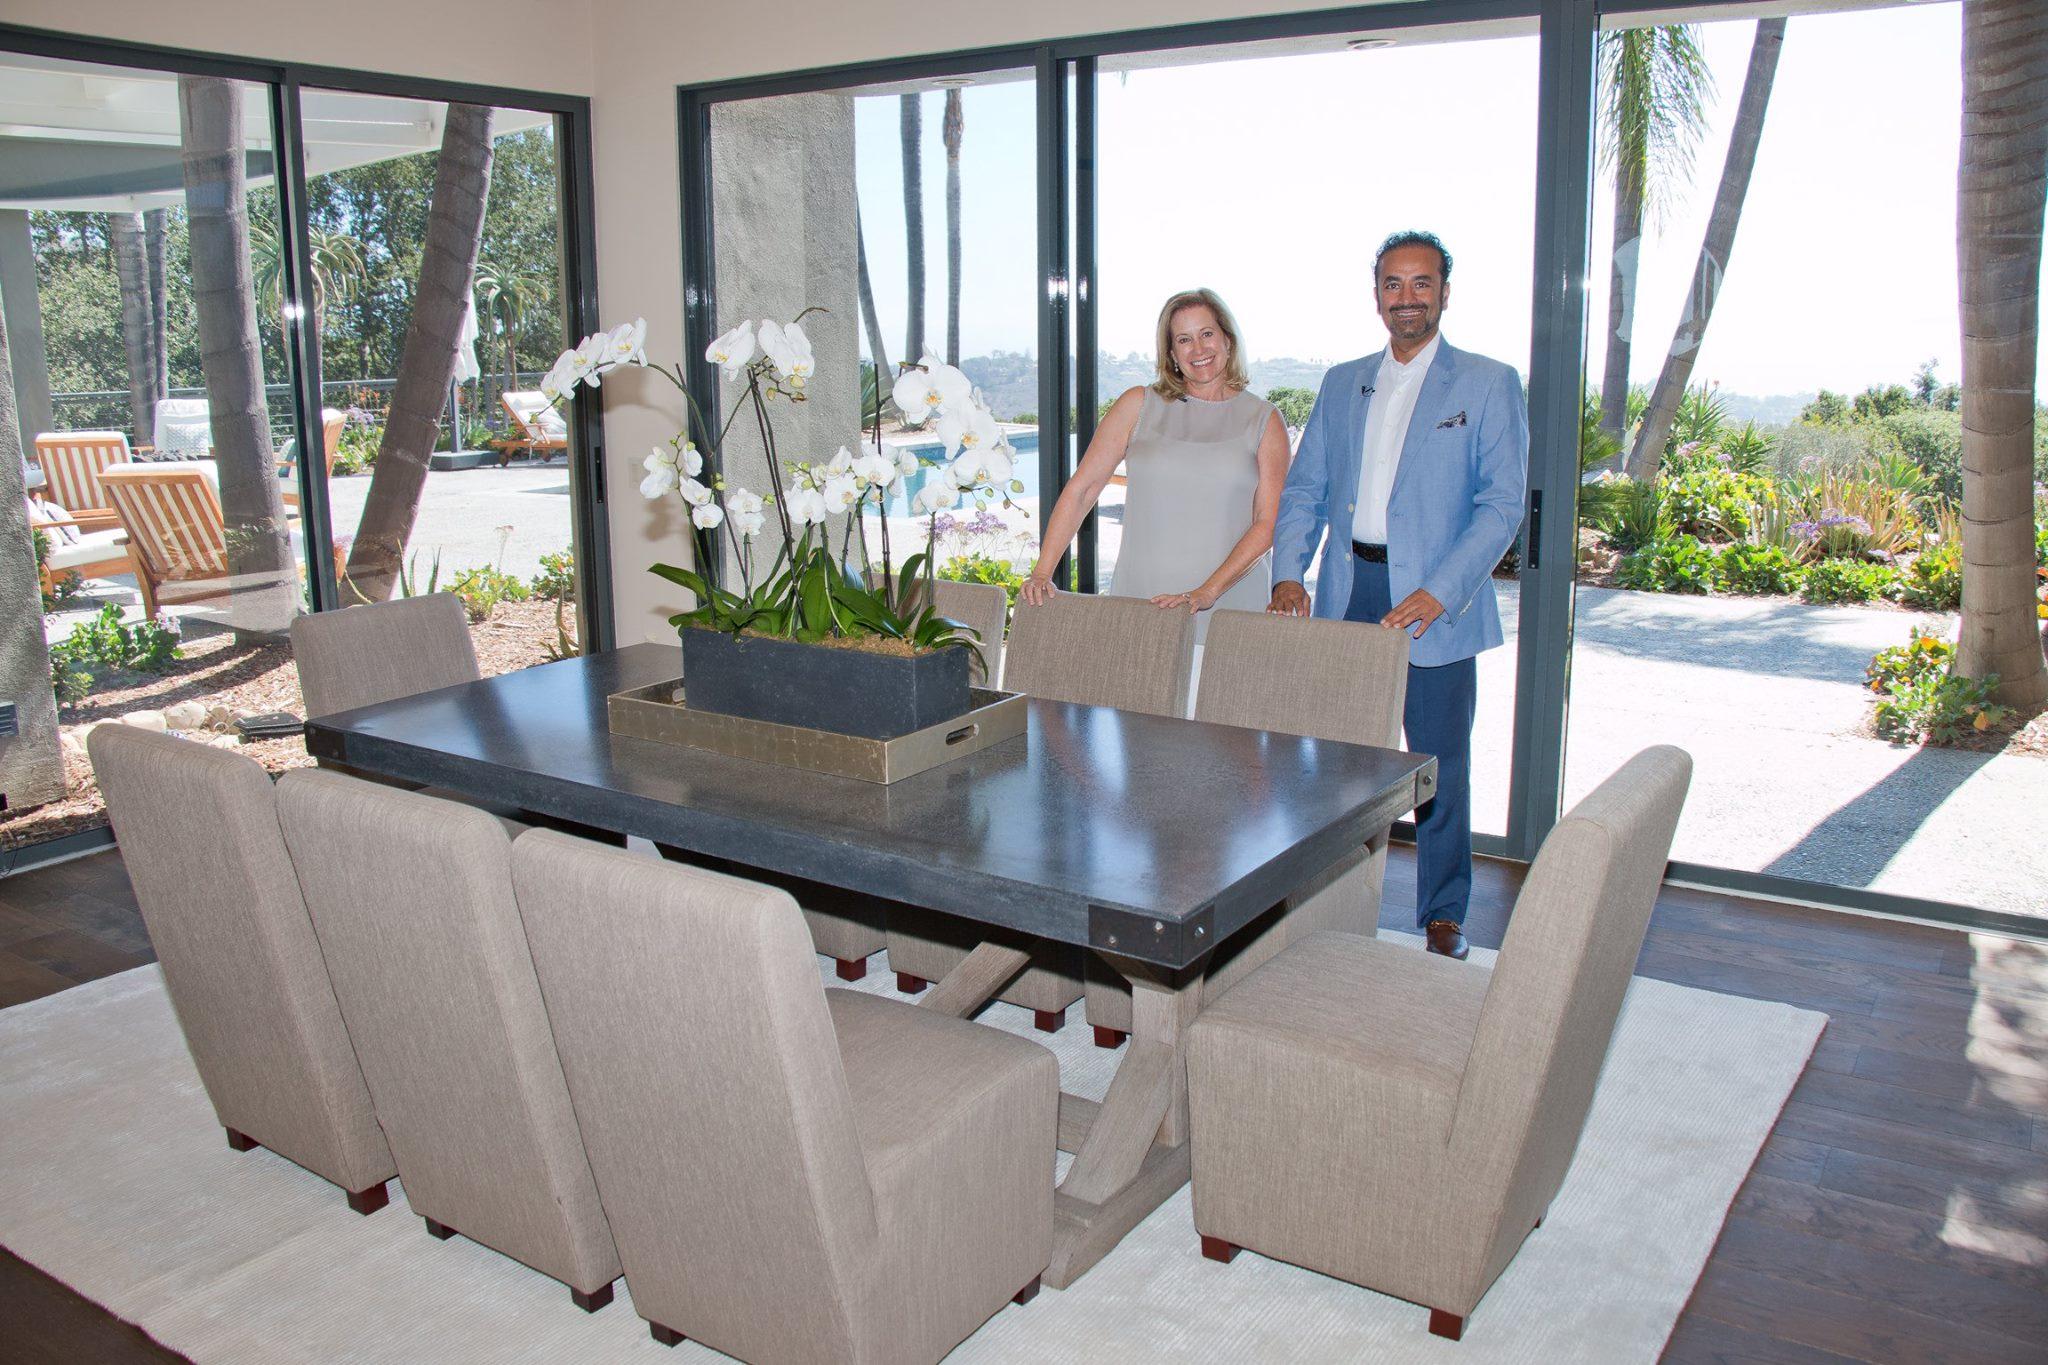 Design Santa Barbara - 04